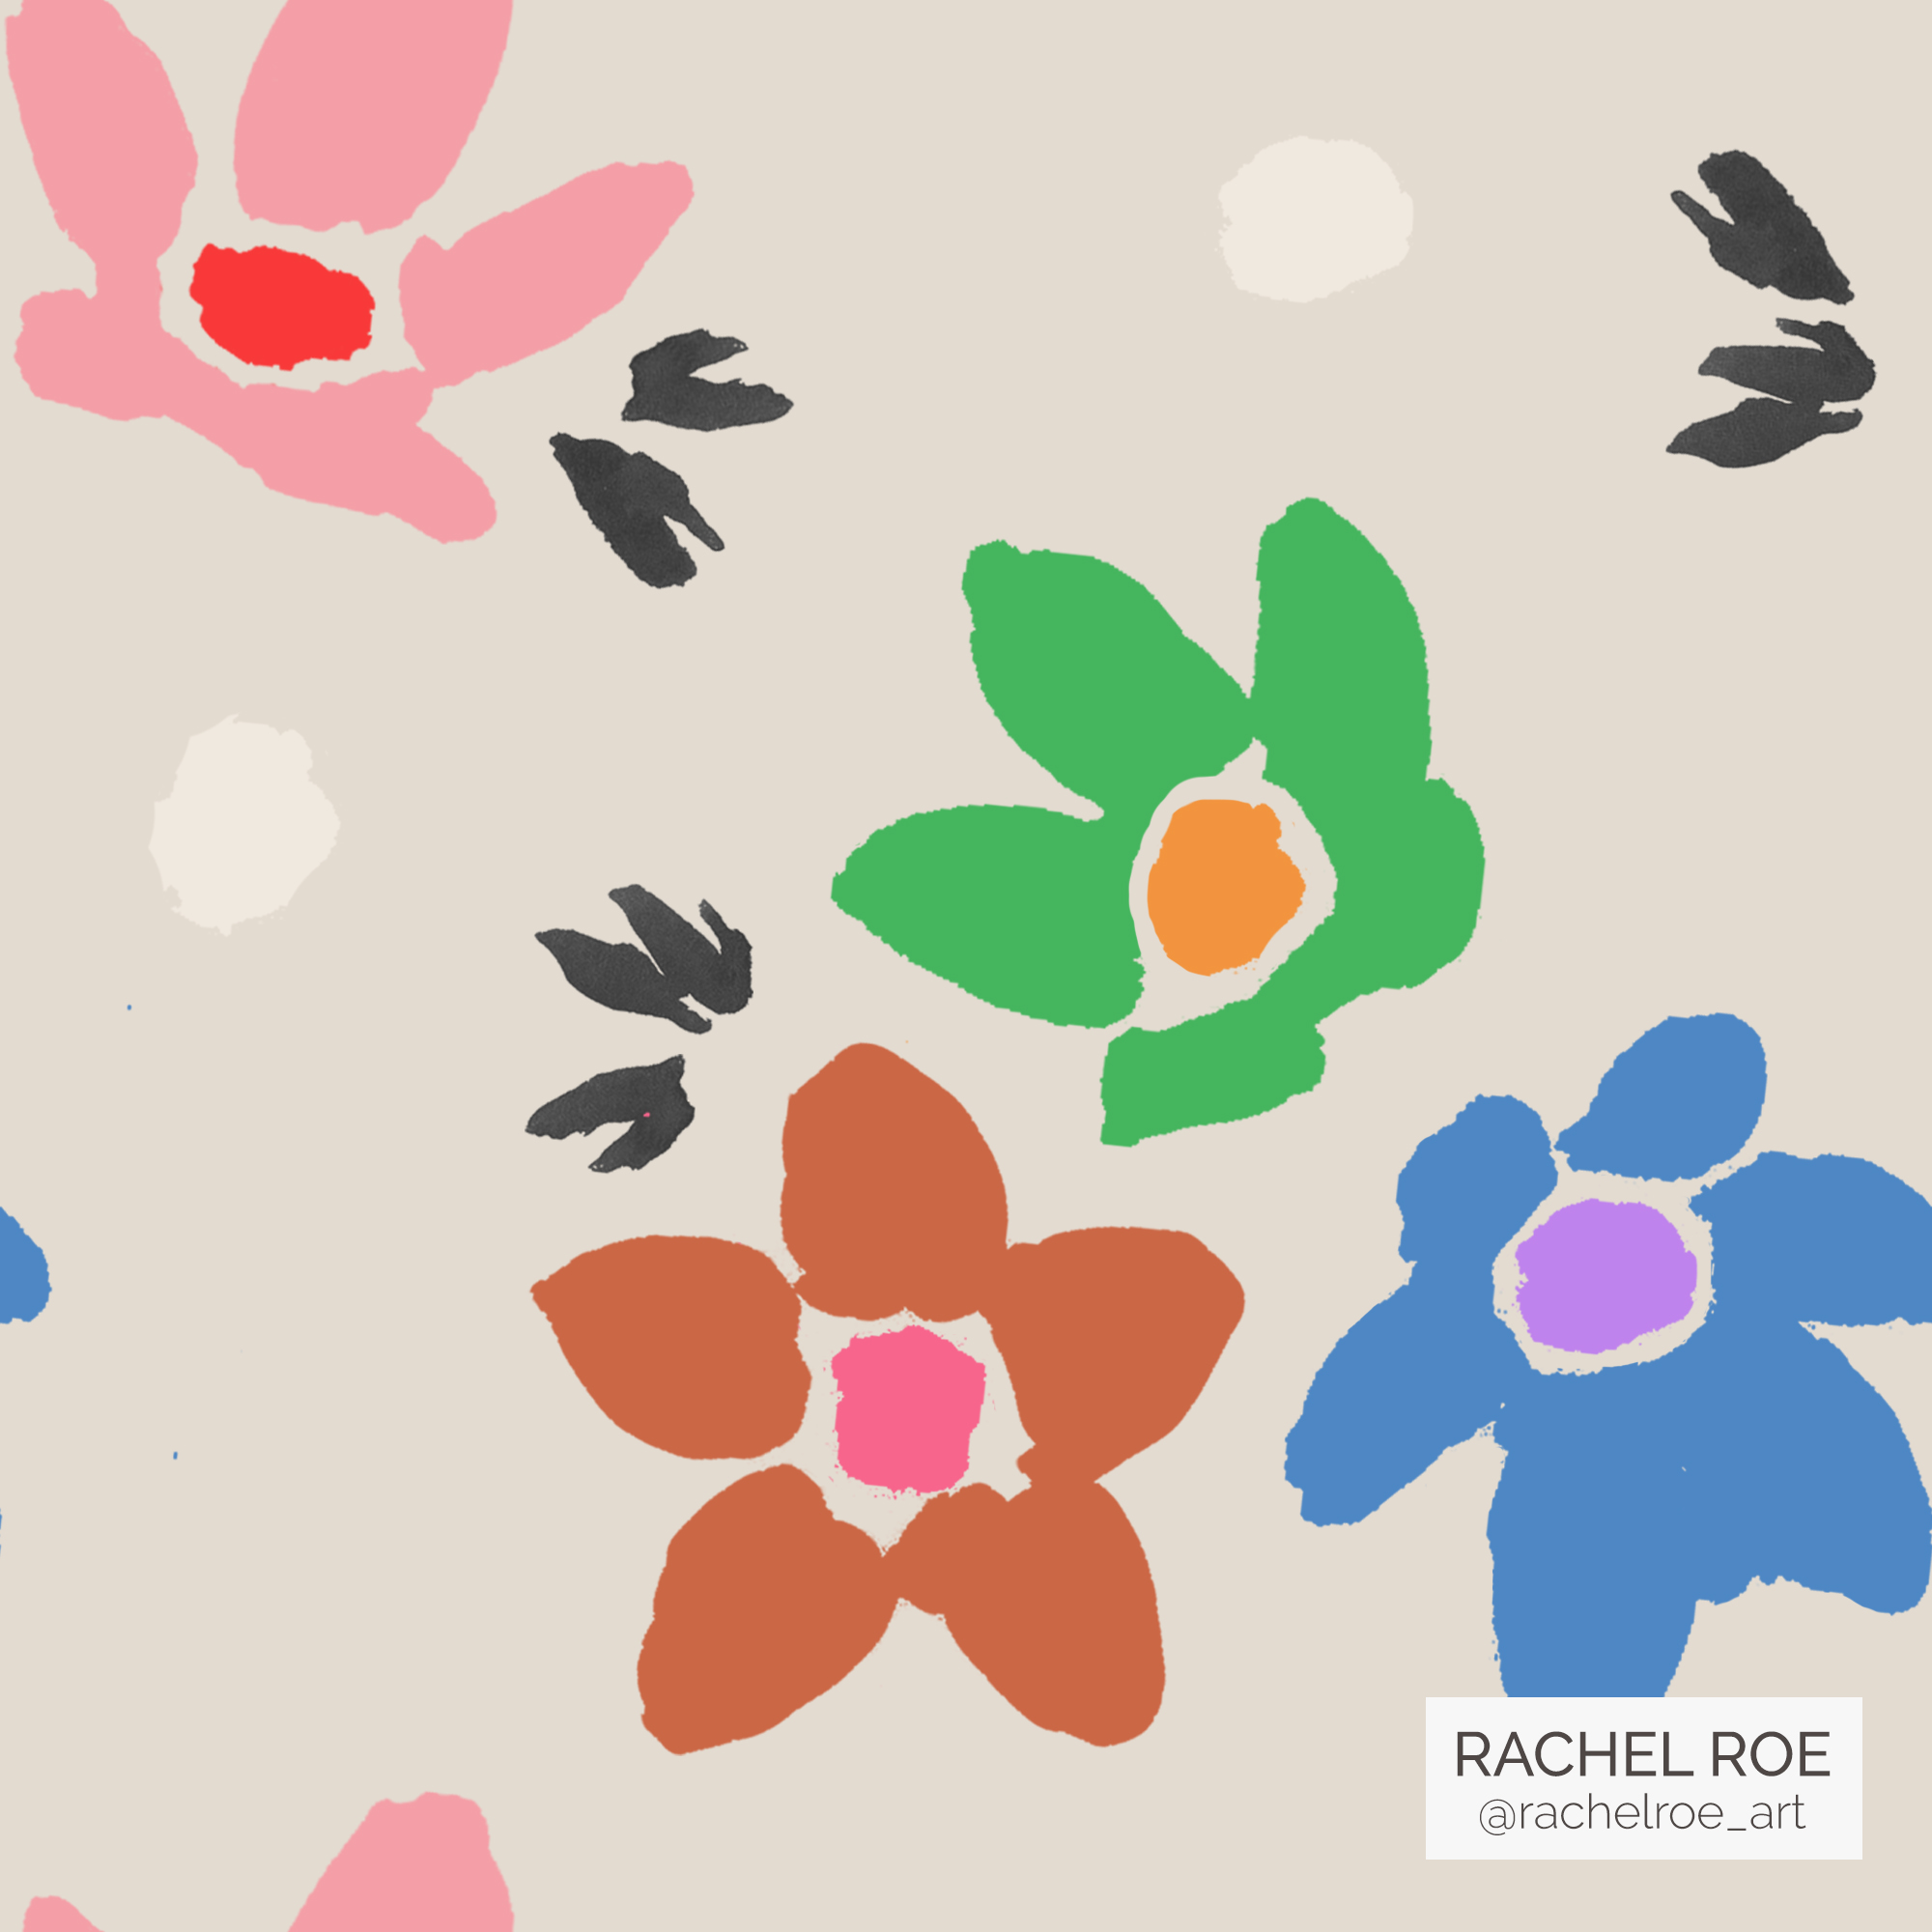 Multicolor Flower_Instagram_Rachel Roe.jpg